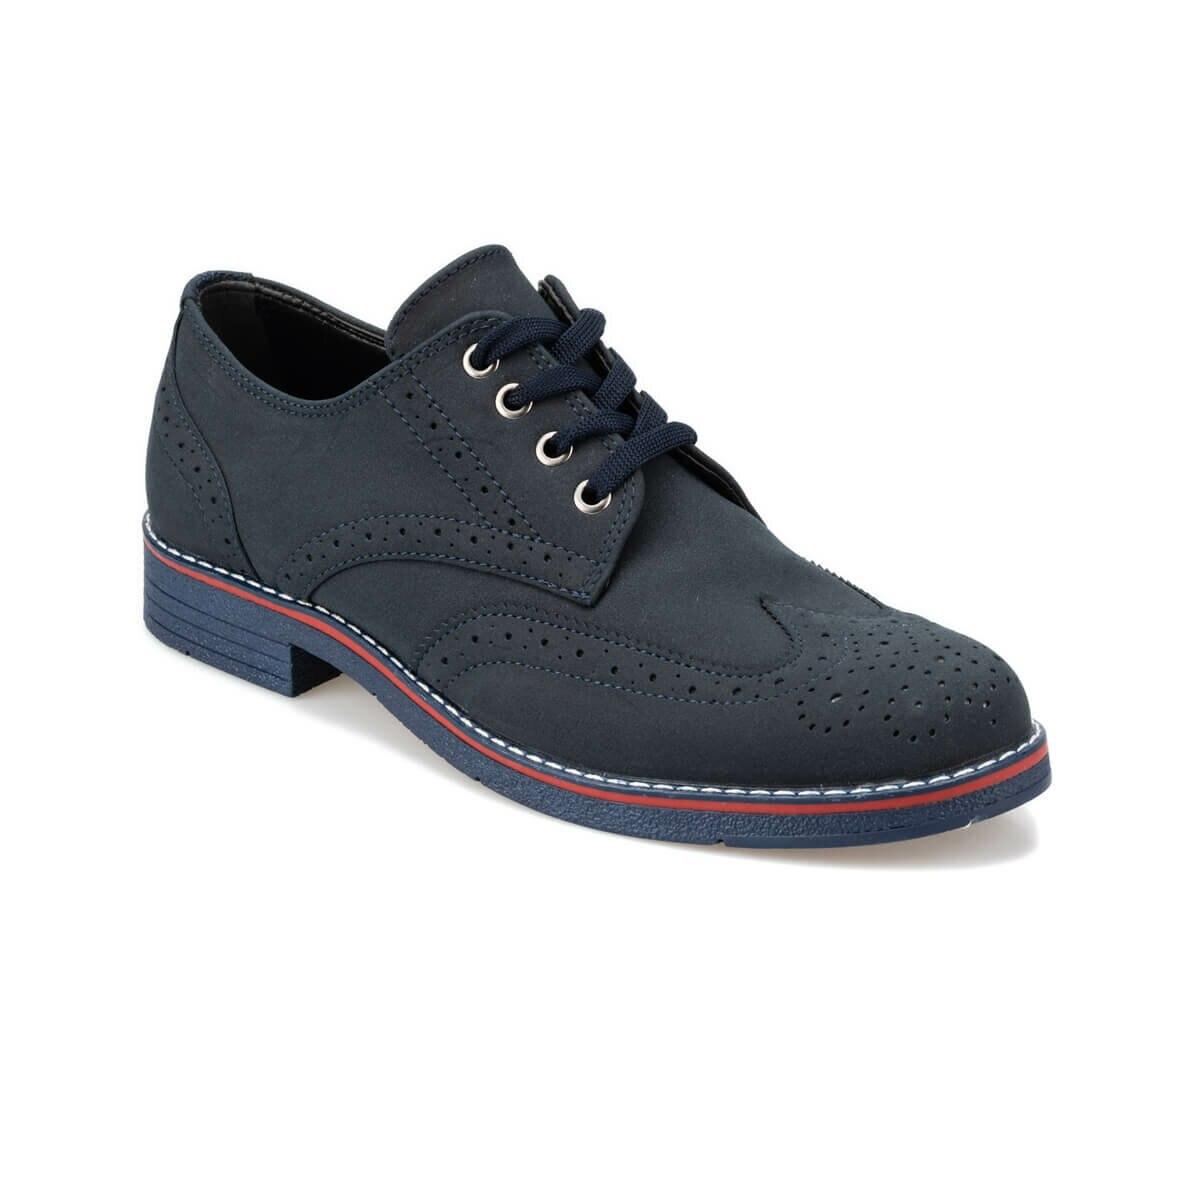 FLO-أحذية رجالية باللون الأزرق الداكن ، 92.356133 ، أحذية رجالية ، Polaris